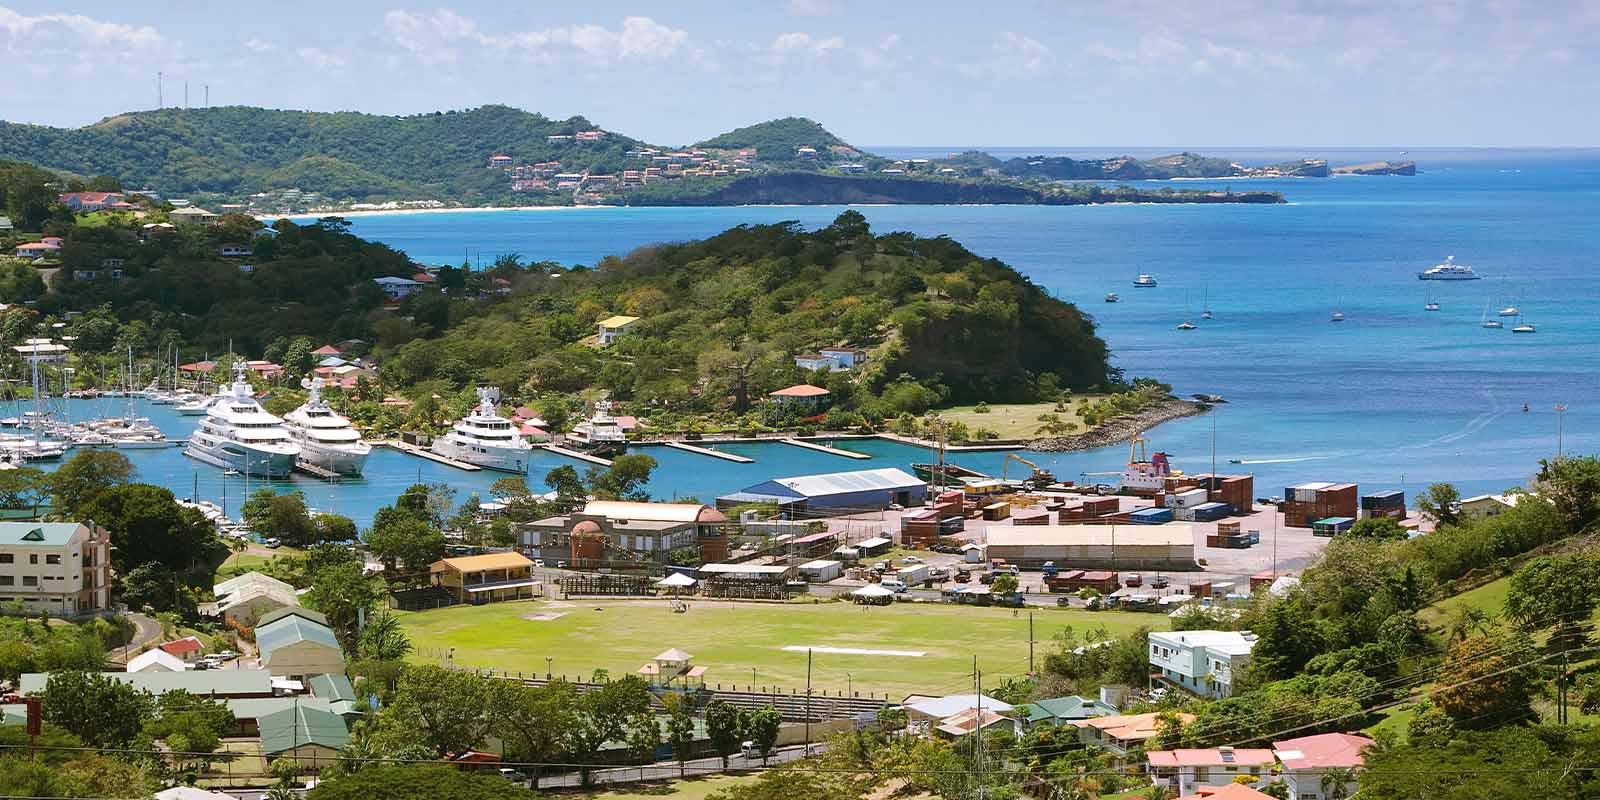 Aerial view of St. George's in Grenada.